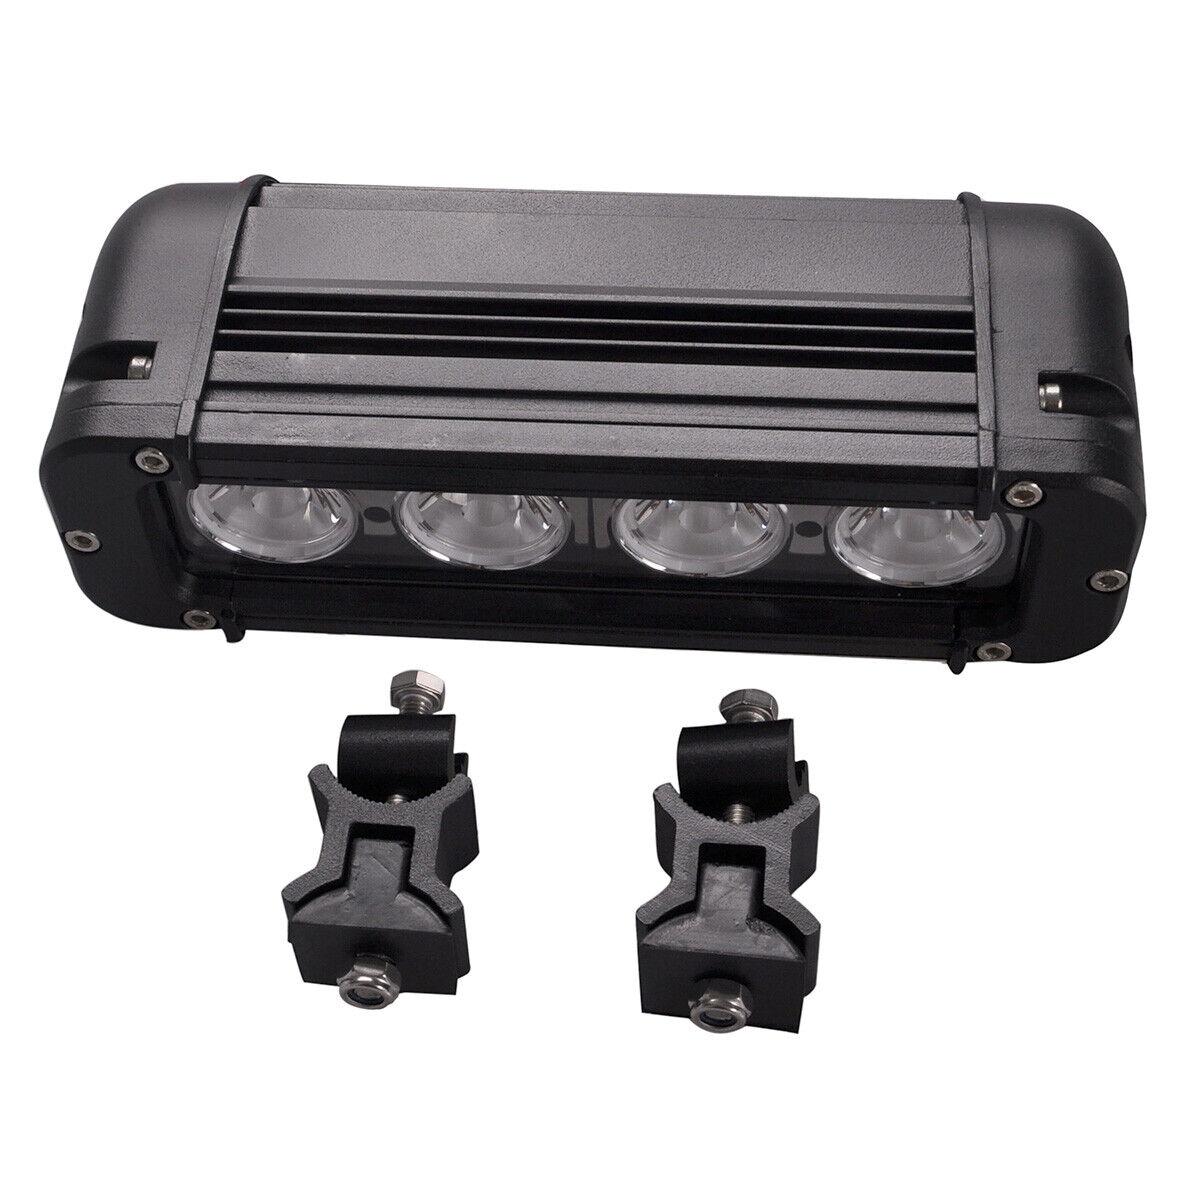 7.8inch 40W Led Spot Work Light Bar 10W Chip Offroad 4×4 Jeep Truck ATV Camper